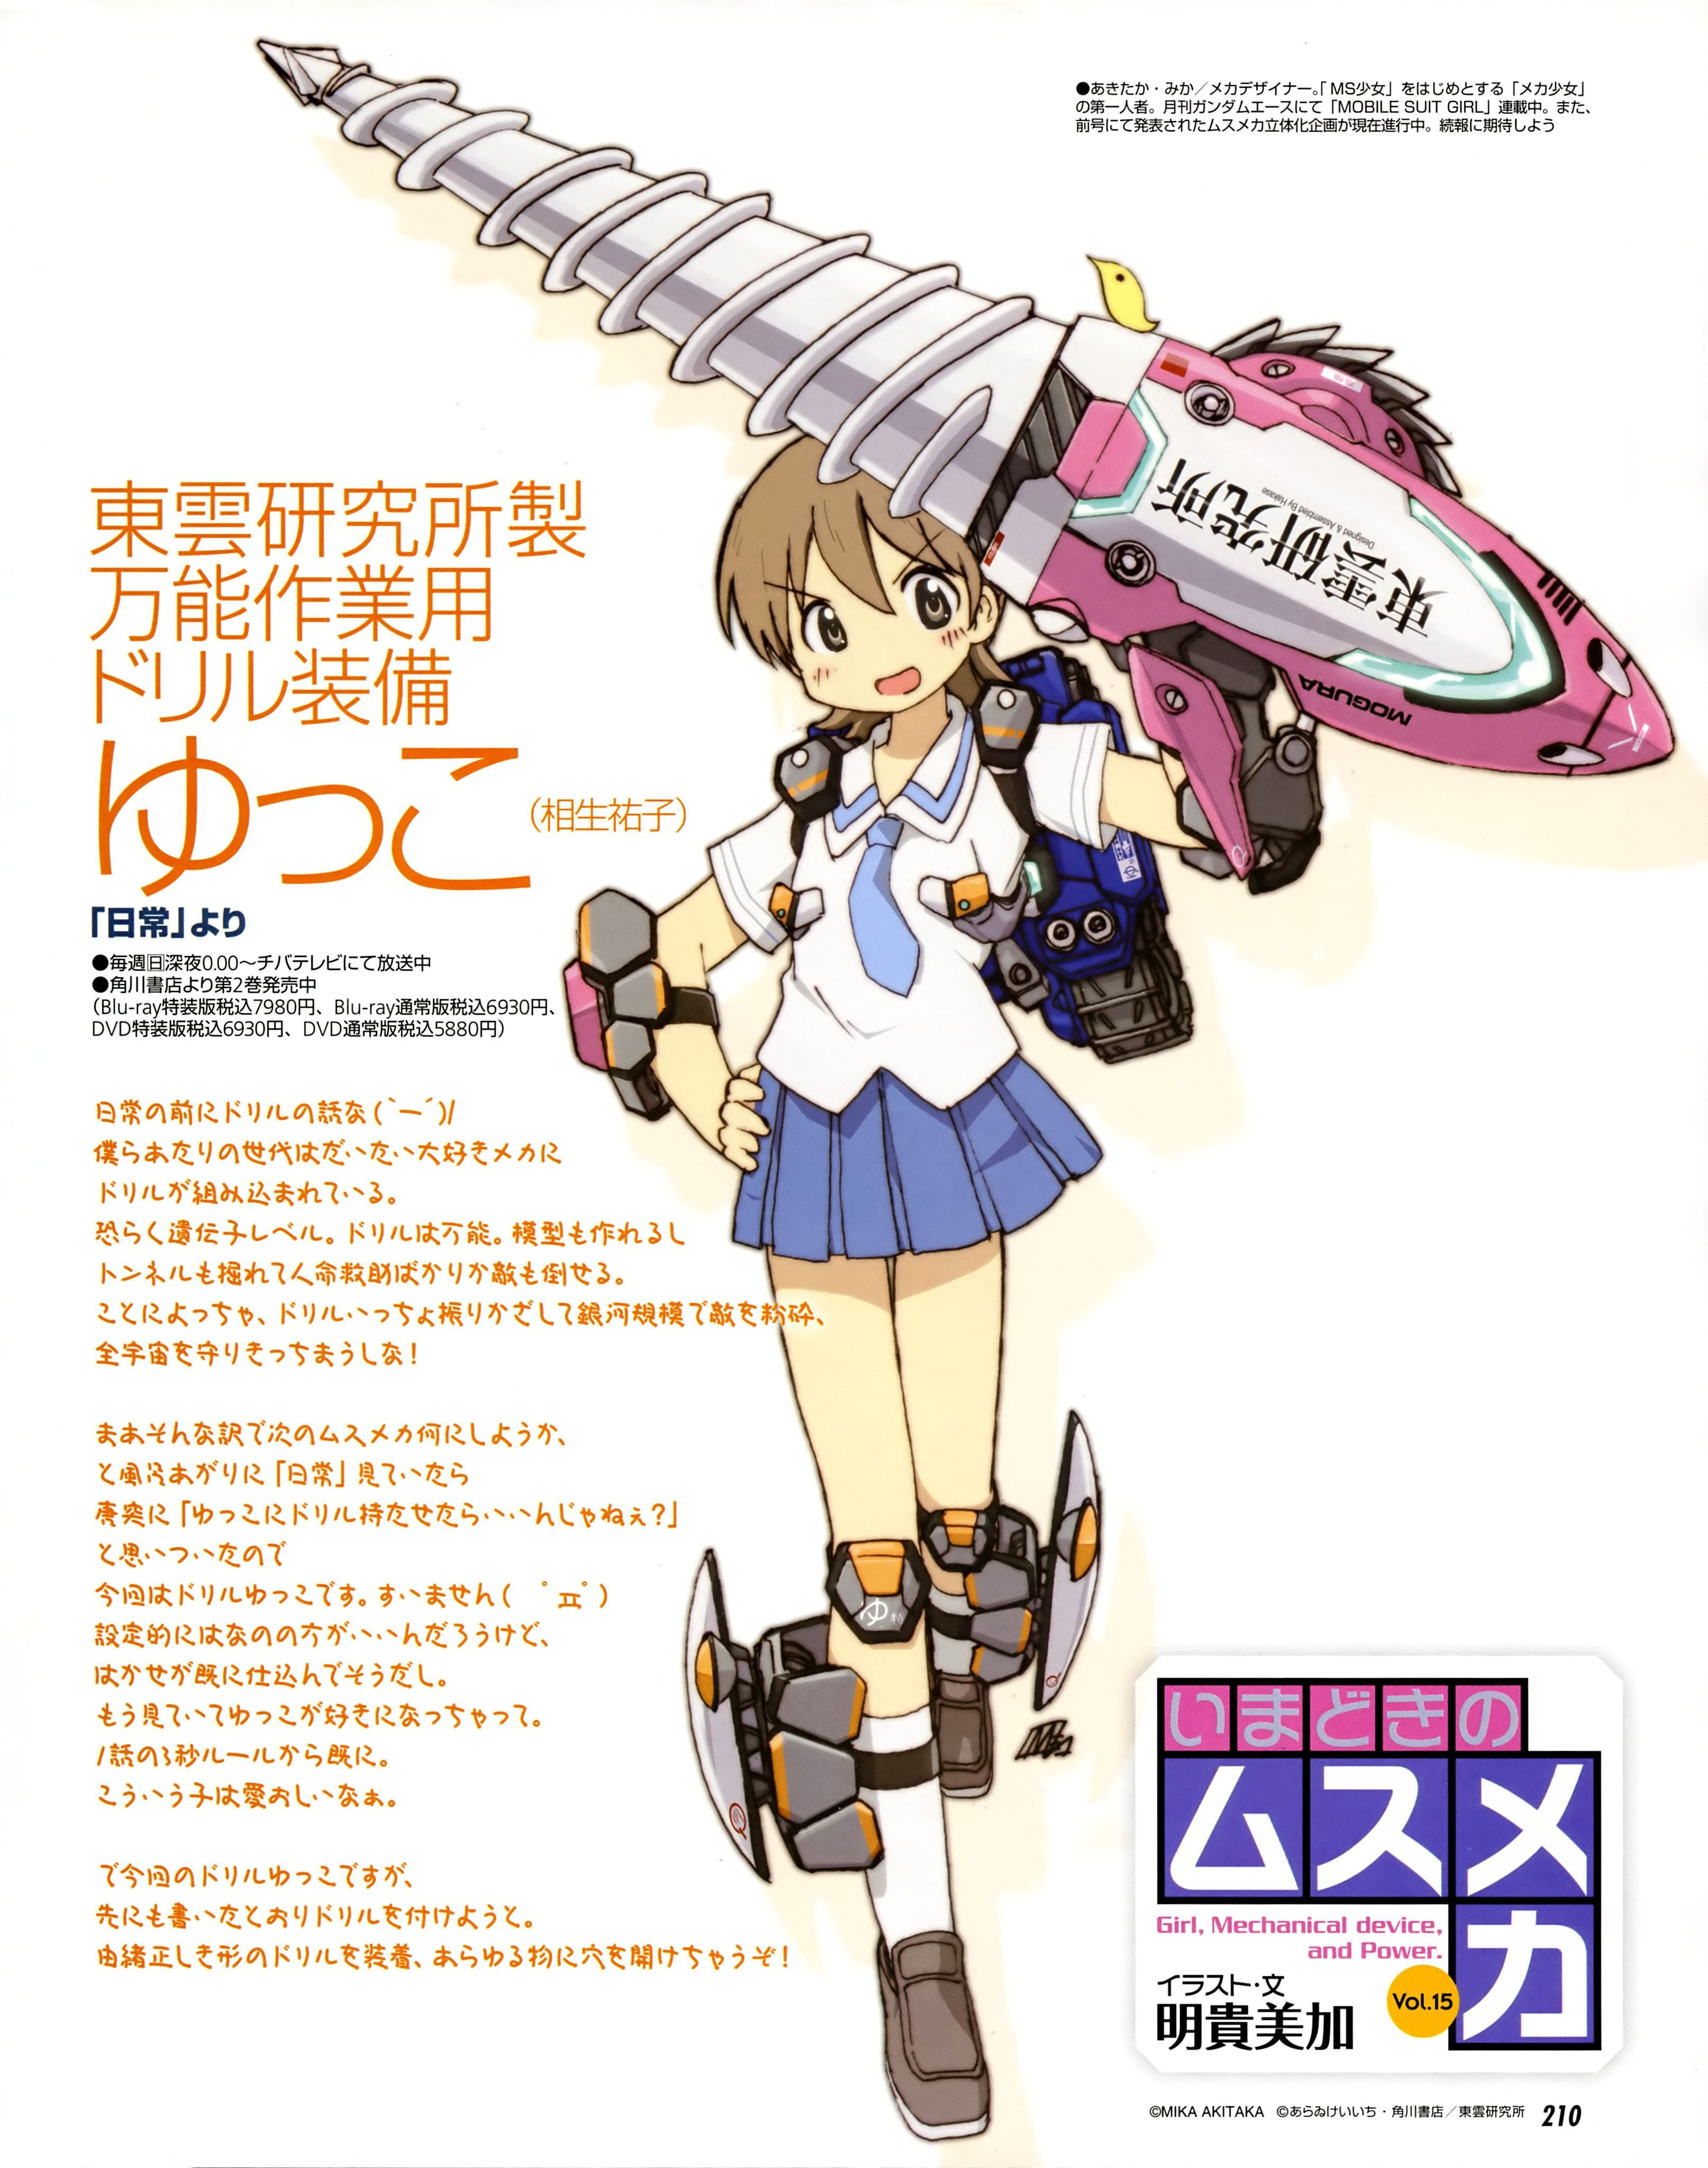 Nichijou official art Nichijou, Anime images, Awesome anime